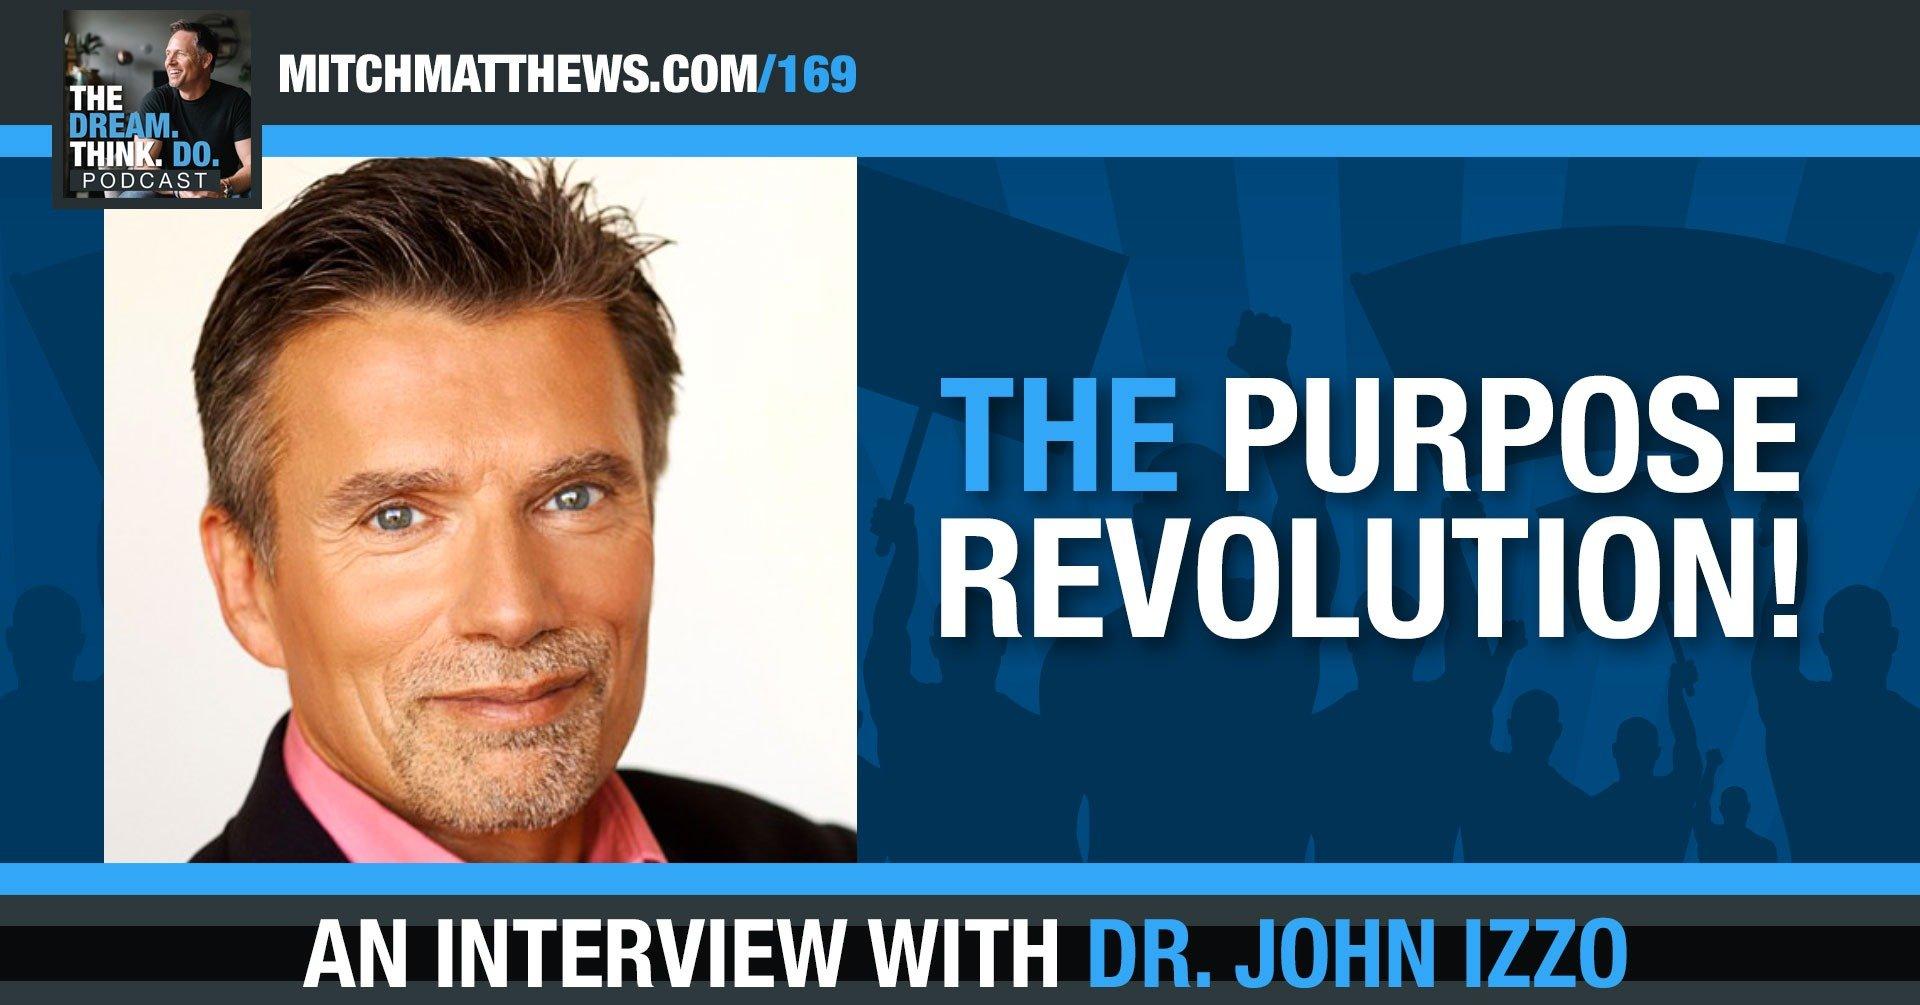 The Purpose Revolution with Dr. John Izzo